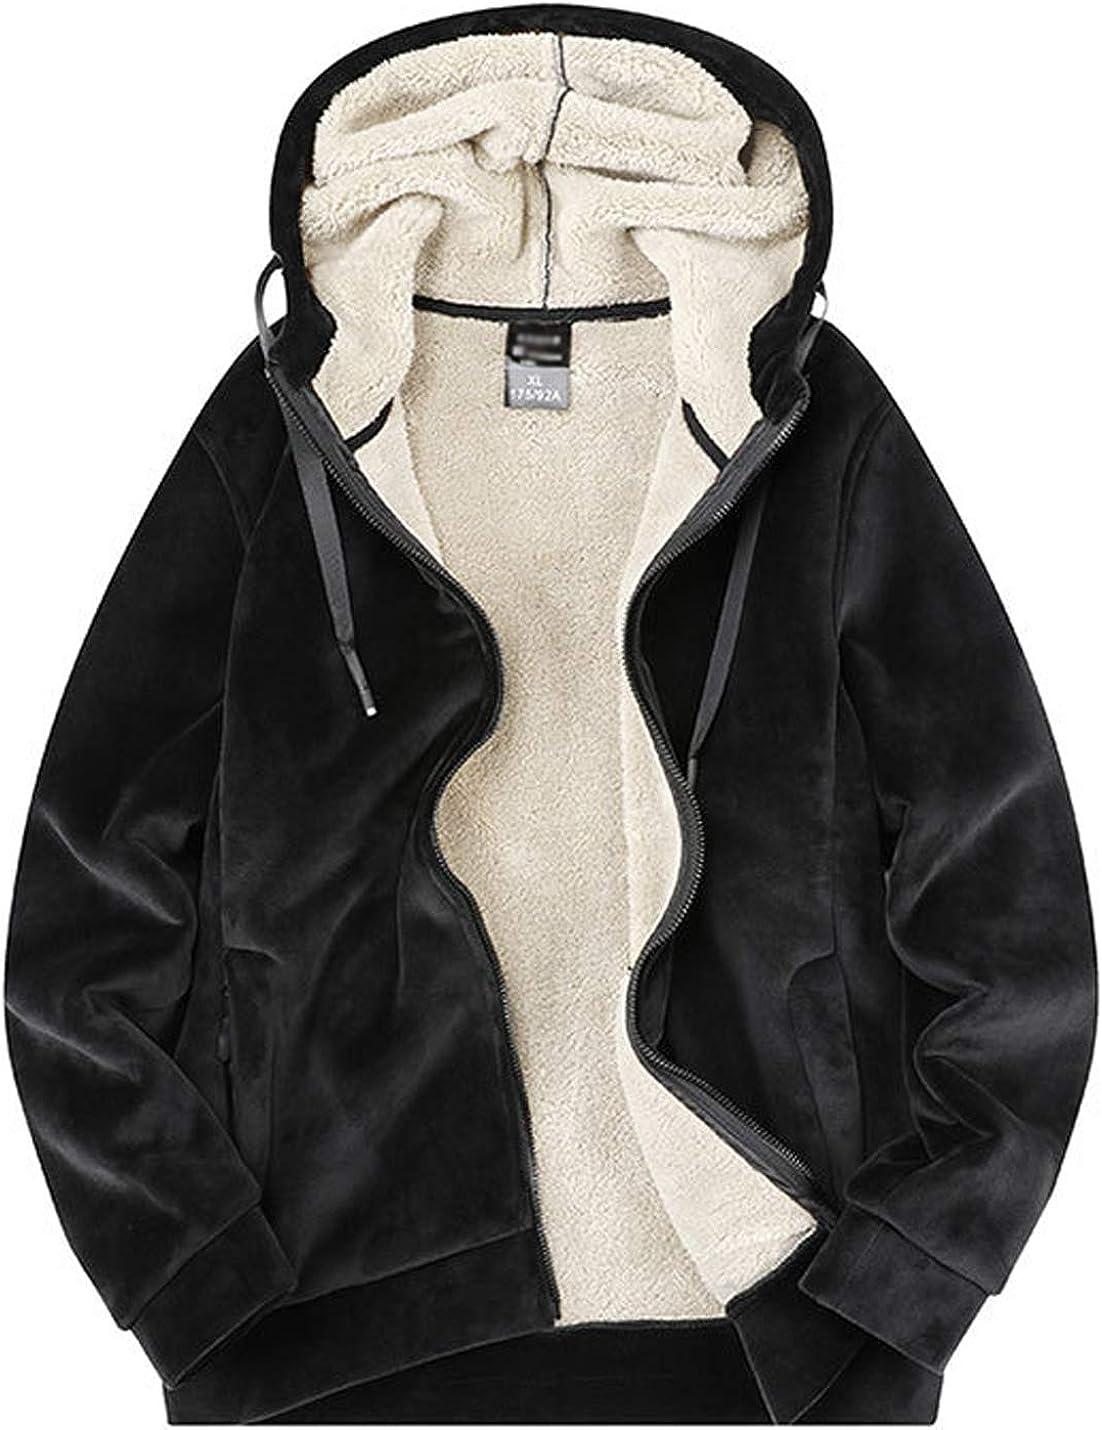 Yimoon Men's Zip Up Sherpa Fleece Hooded Outerwear Sweatshirt Coat with Drawstring